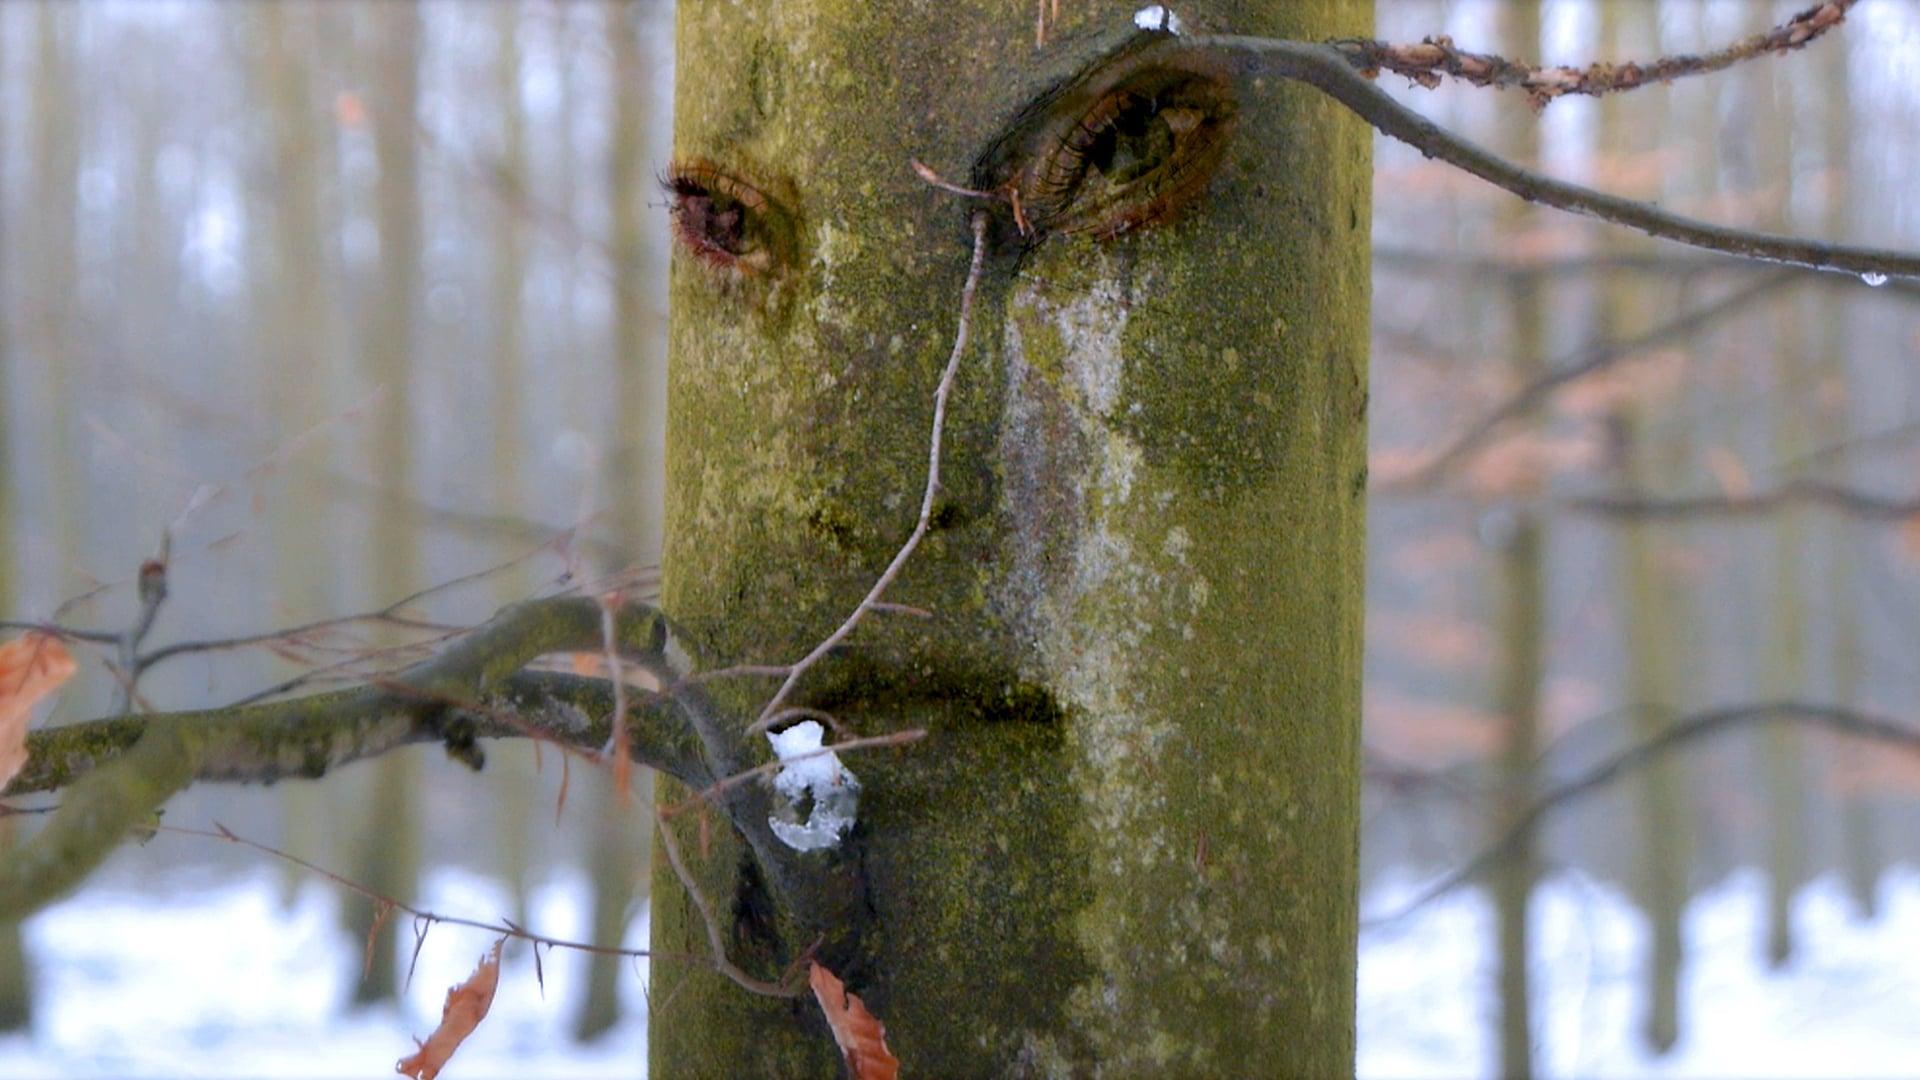 'Forest Dwellers' - film excerpt 'Milkmaid'